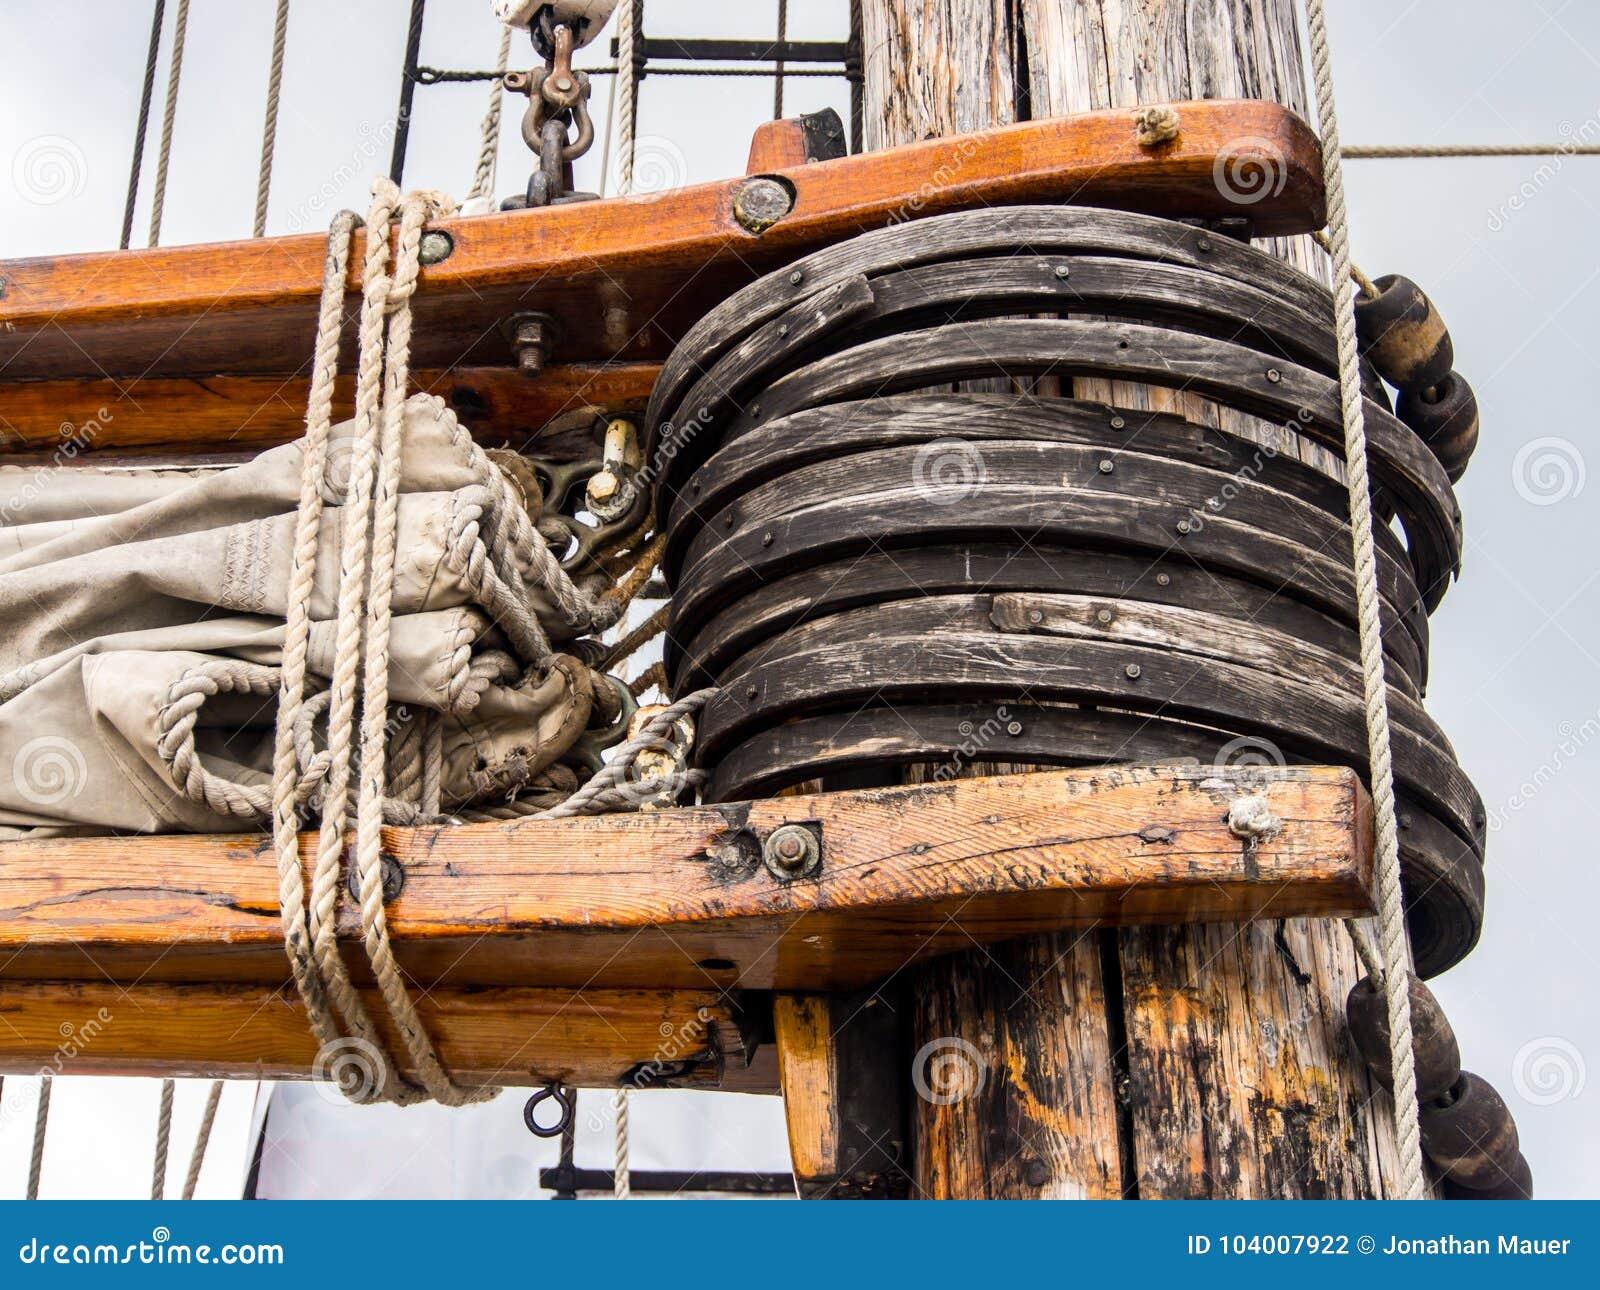 Close Up Detail Of Sail Rigging, Old Ship Mast Stock Photo - Image